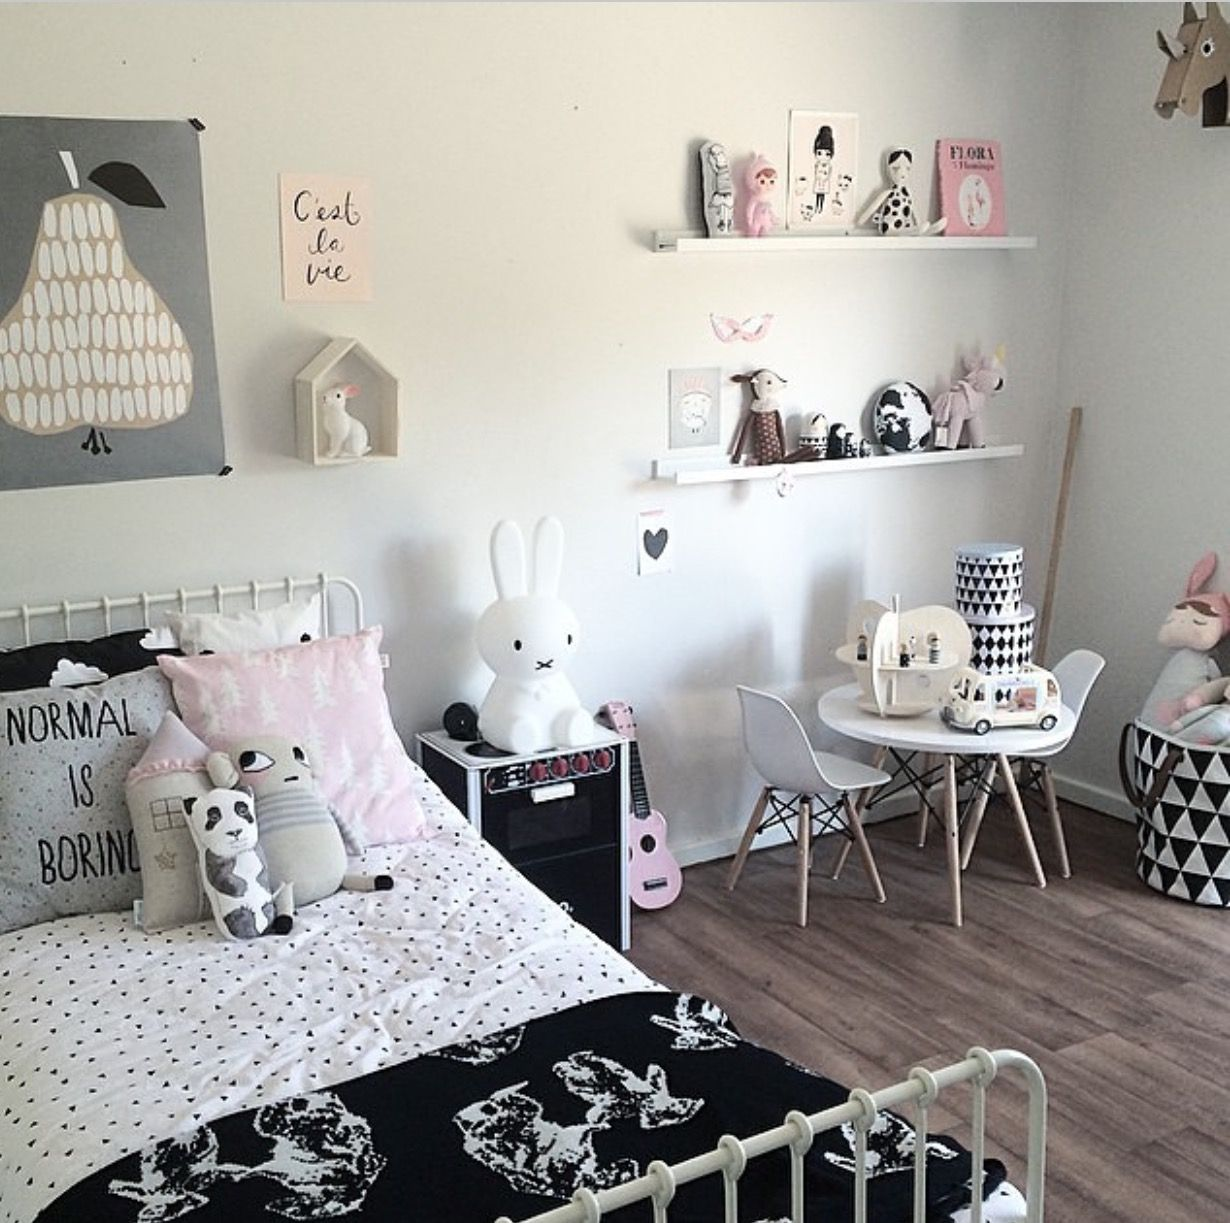 normal kids bedroom. Sweet Grey, Black And Pink Room For Little Girl Normal Kids Bedroom O